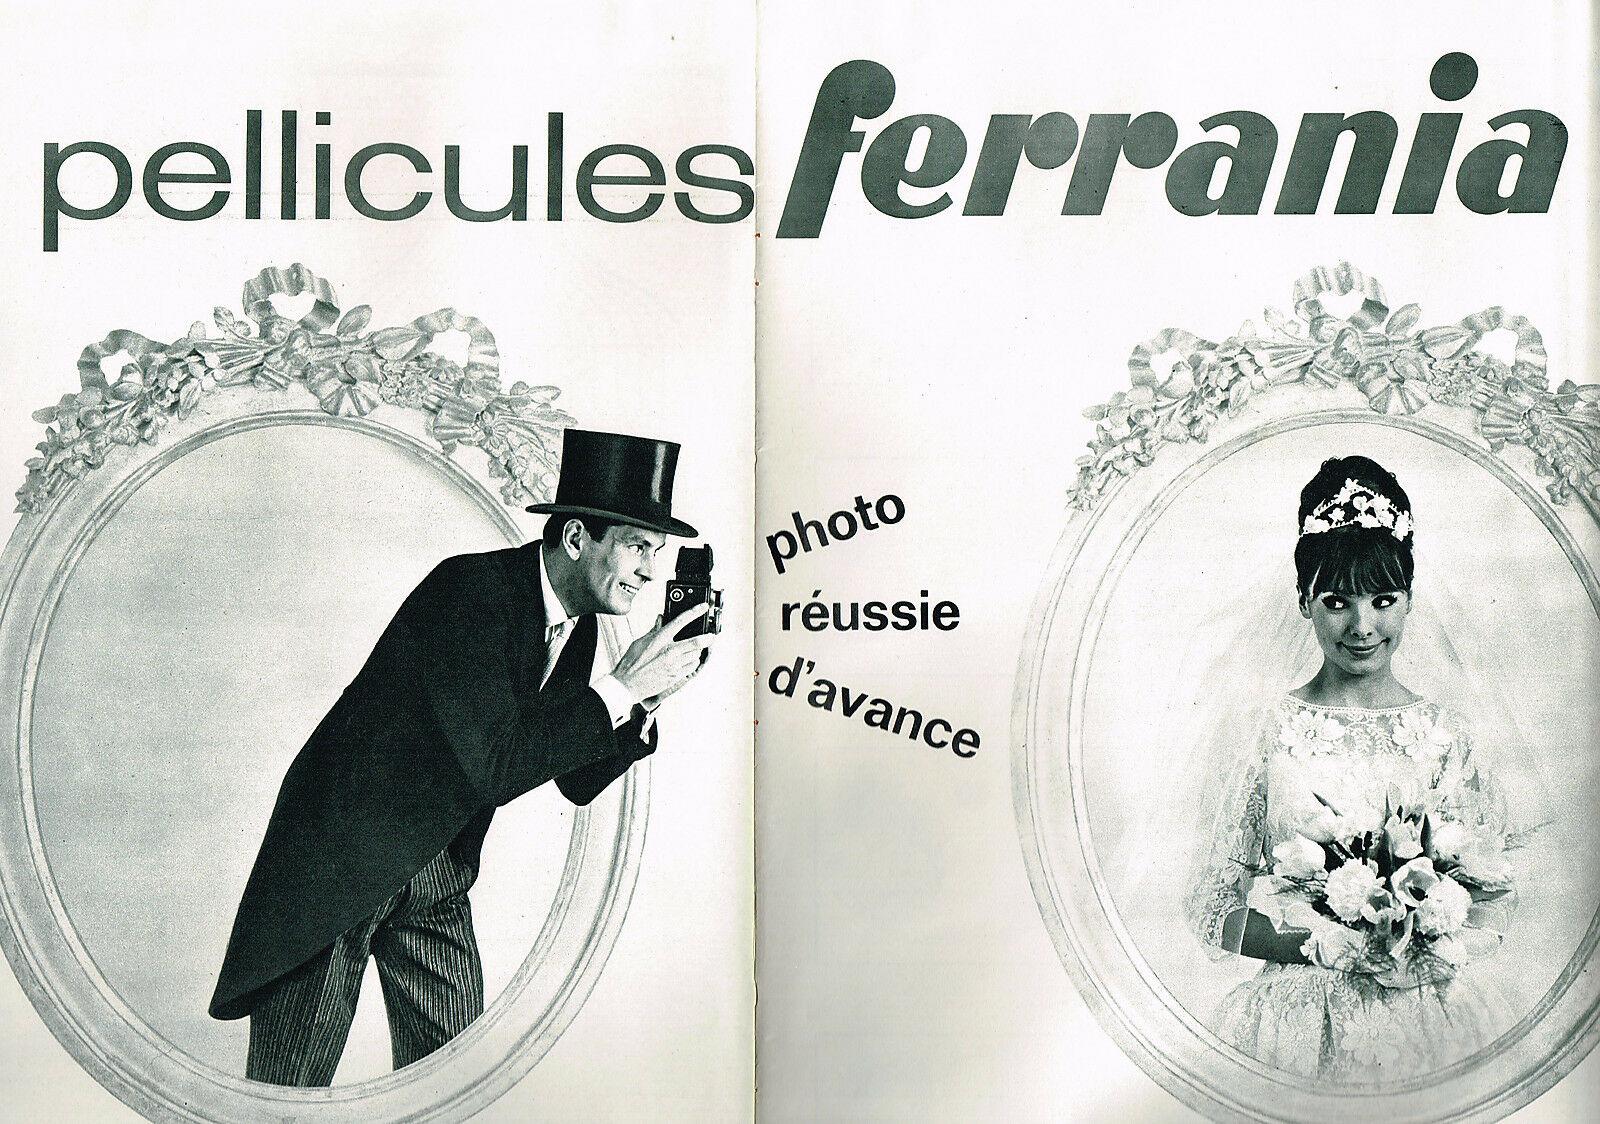 1963 Pellicules Ferraniajpg